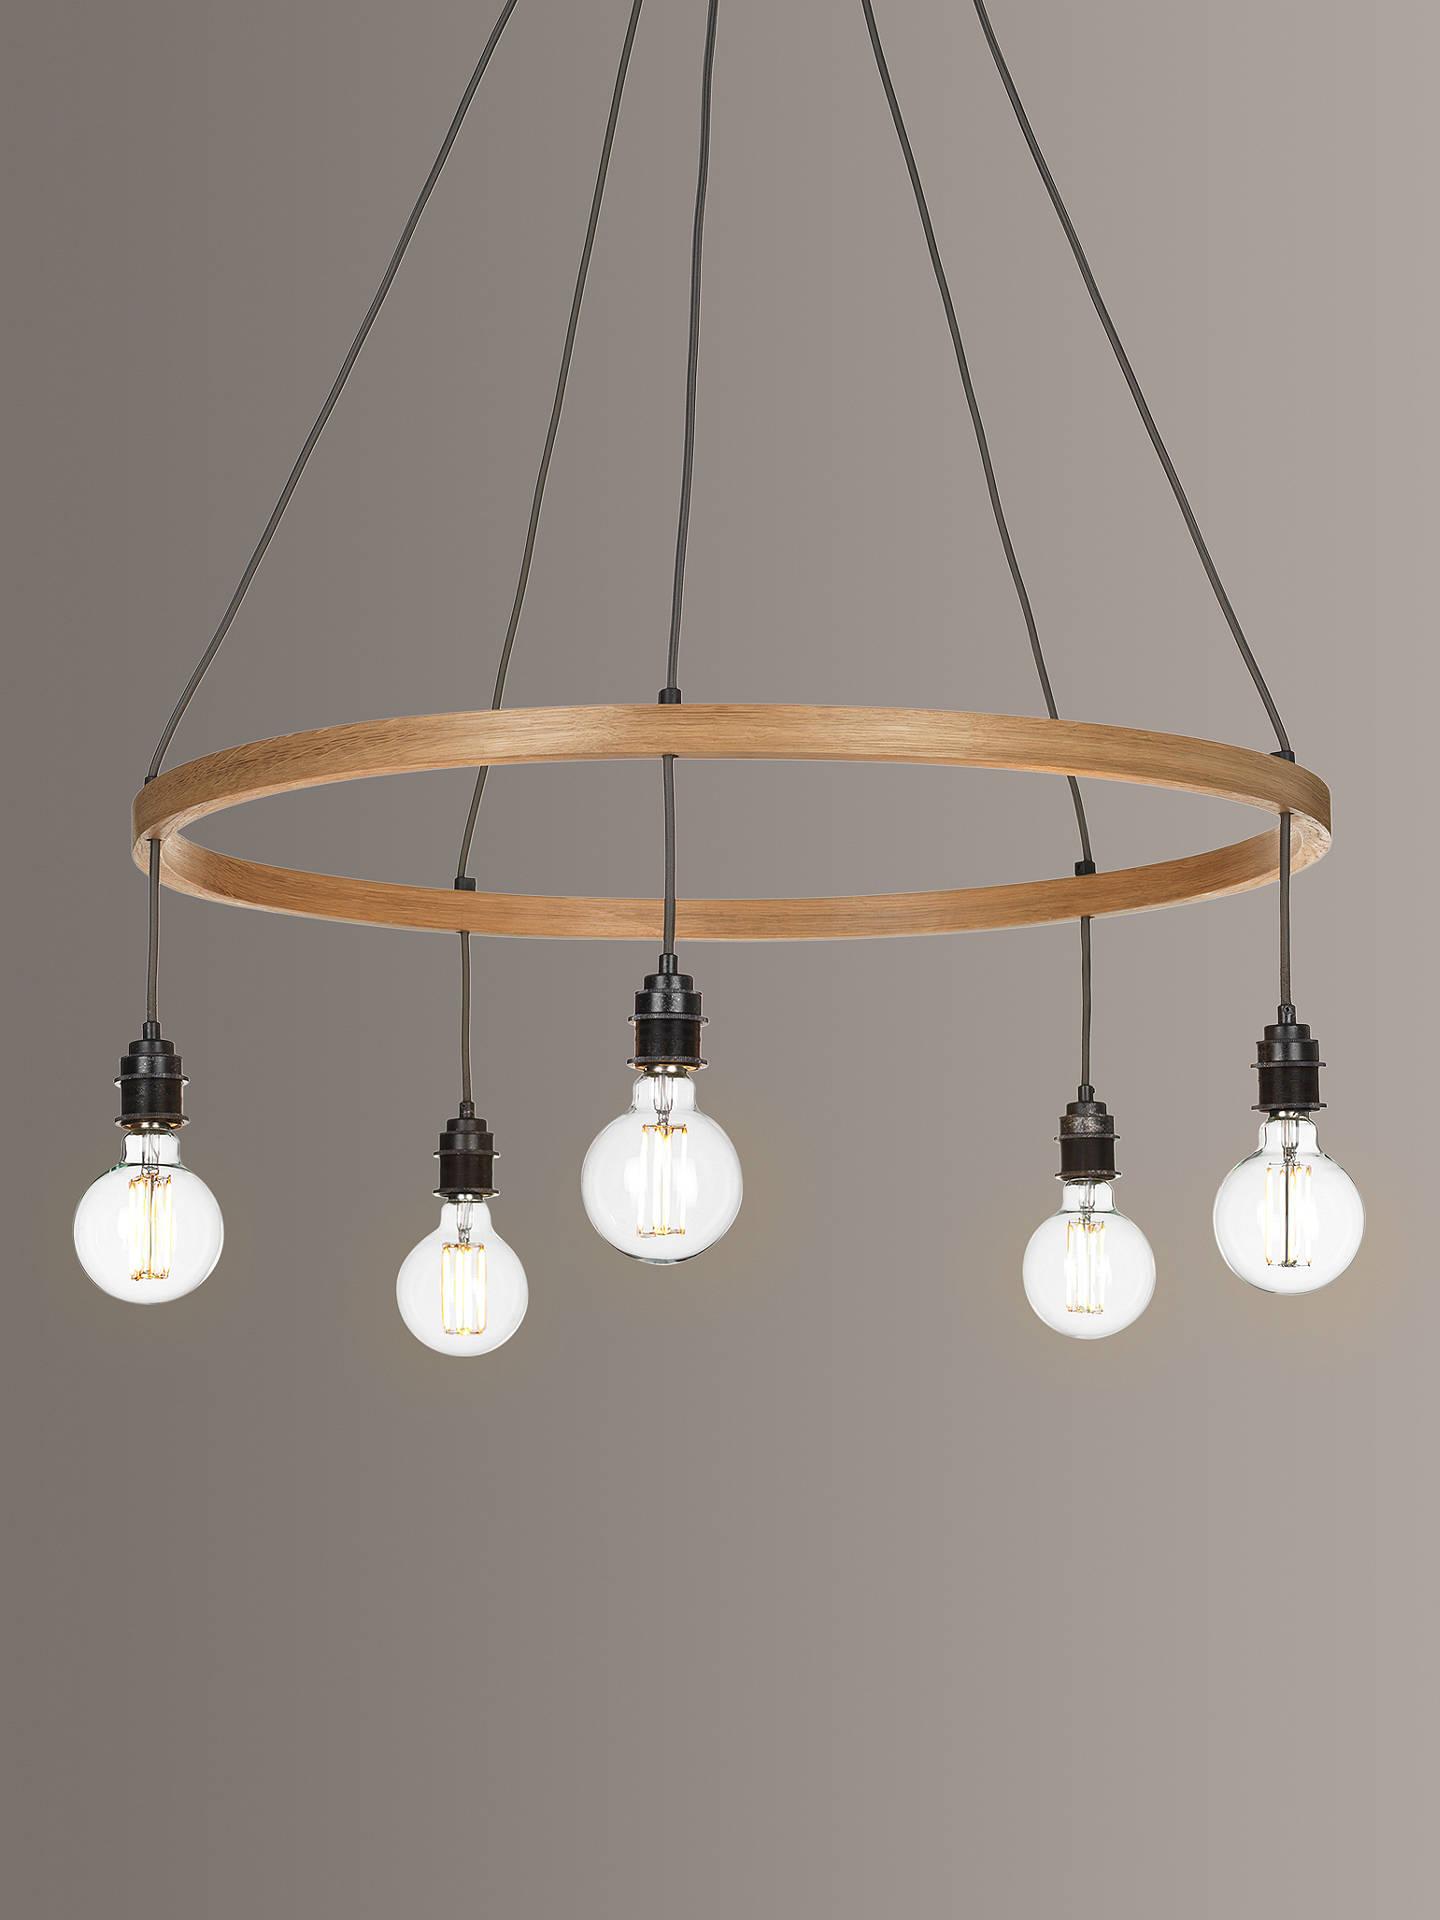 pretty nice d91fd 692e6 Tom Raffield Kern Hoop Pendant Ceiling Light, 5 Light, Wood, 80cm